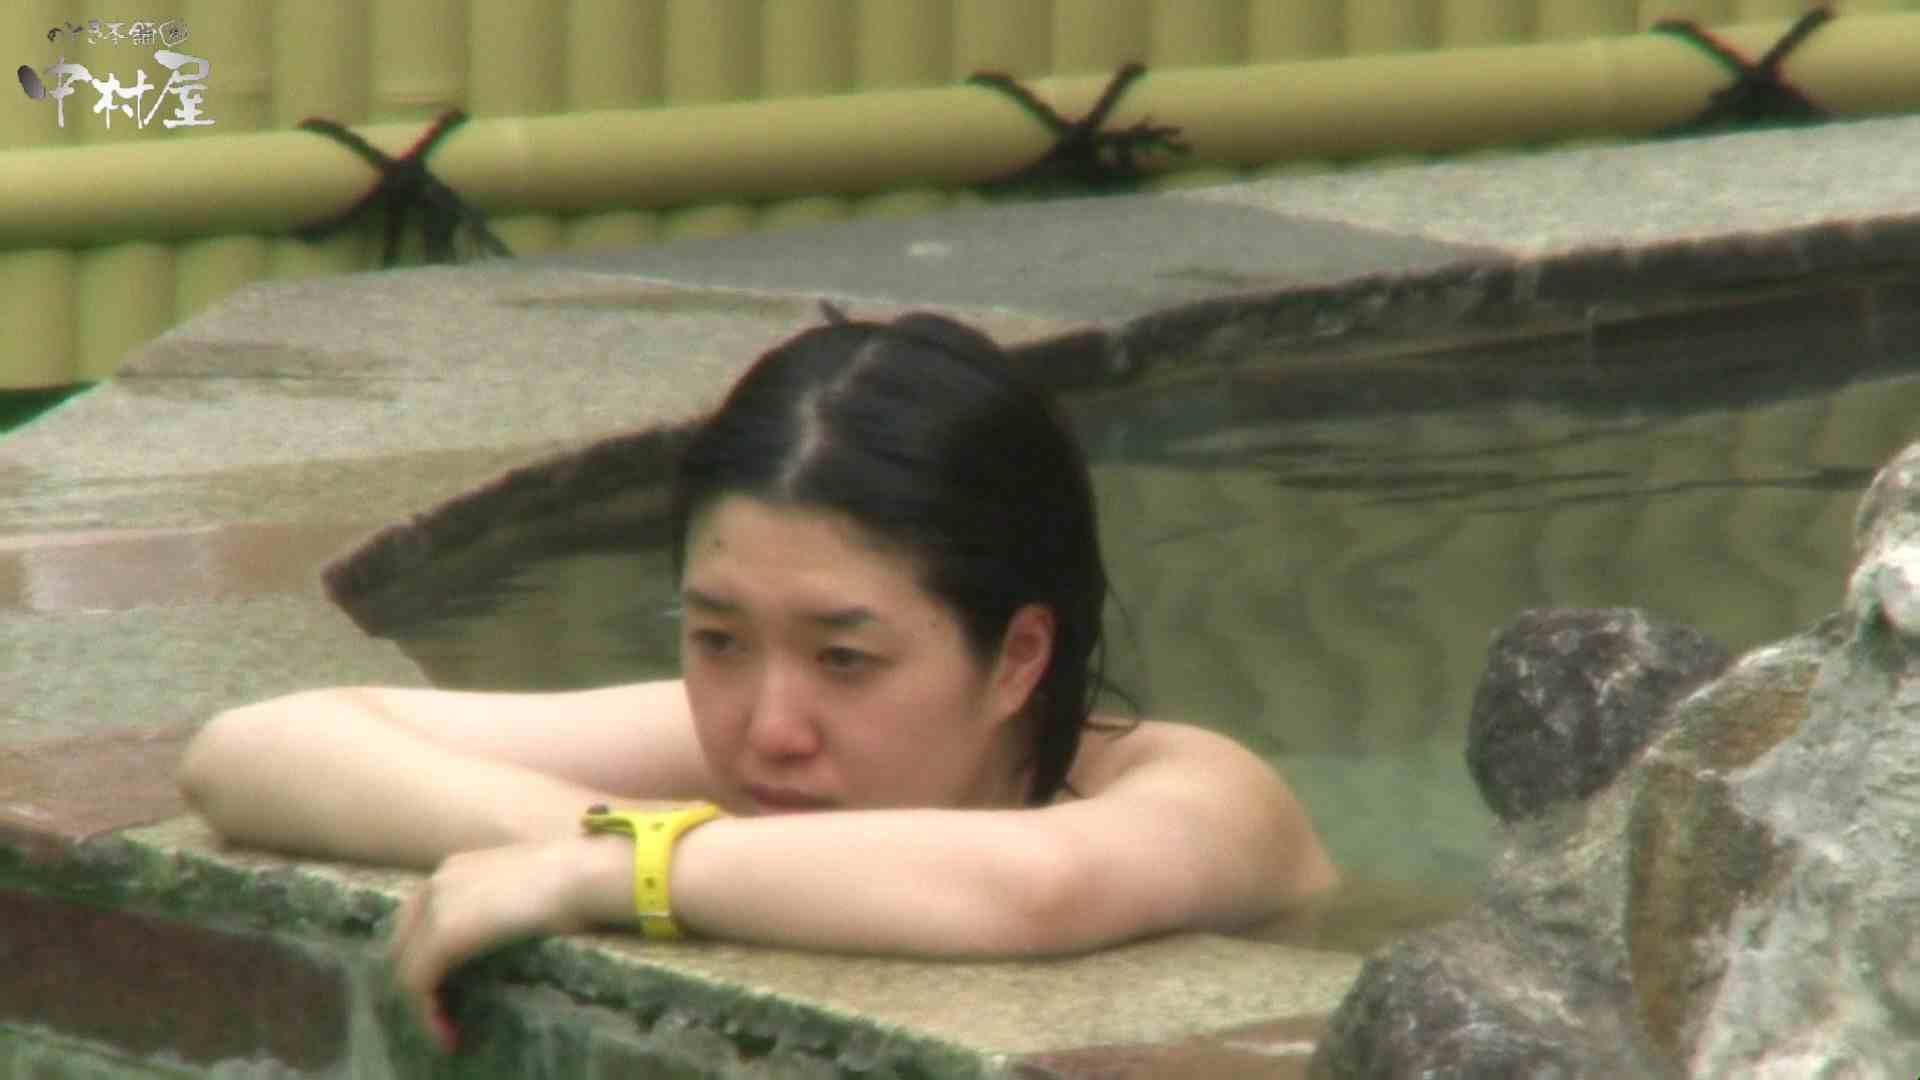 Aquaな露天風呂Vol.946 OLセックス | 盗撮  64画像 19